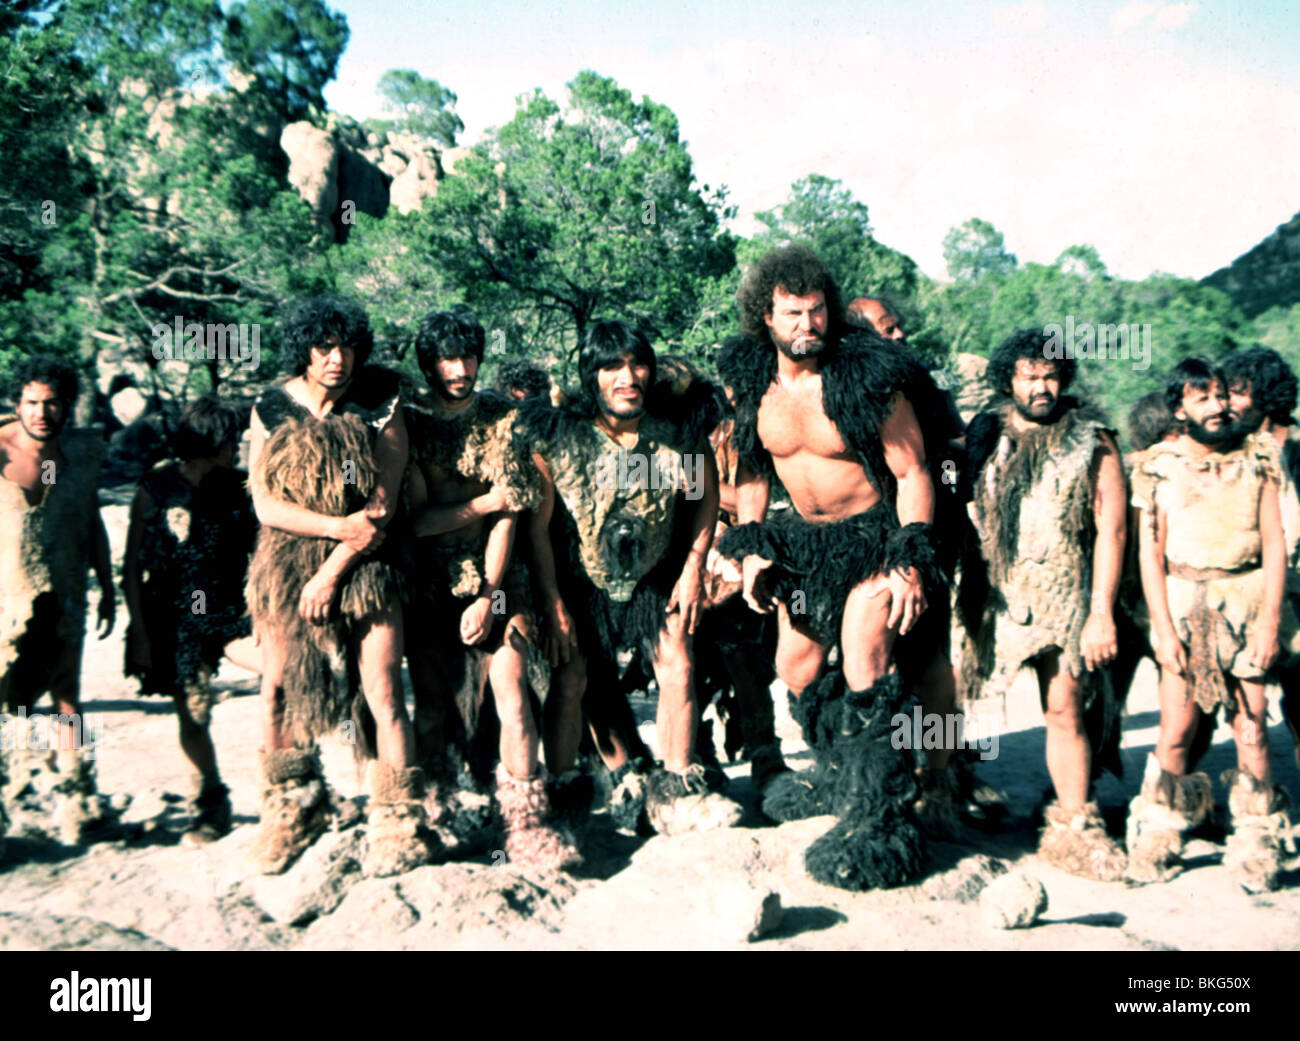 CAVEMAN -1981 - Stock Image